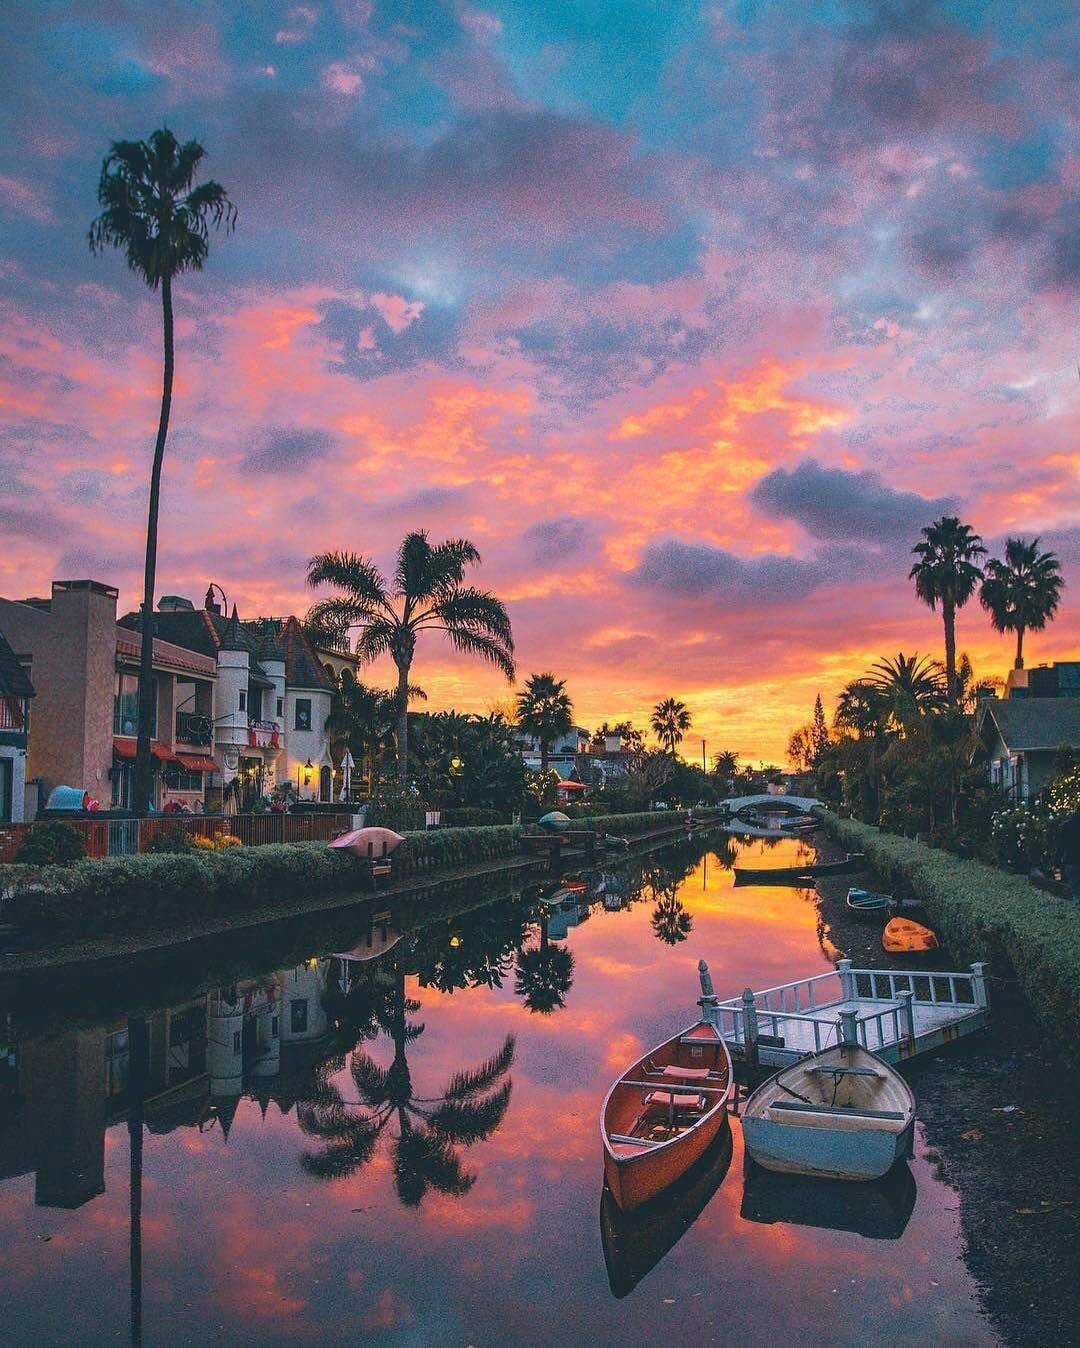 Venice Beach Canals + 25 Best Photo Spots in LA // Local Adventurer #discoverla #losangeles #la #lalaland #visitcalifornia #california #mural #instagram